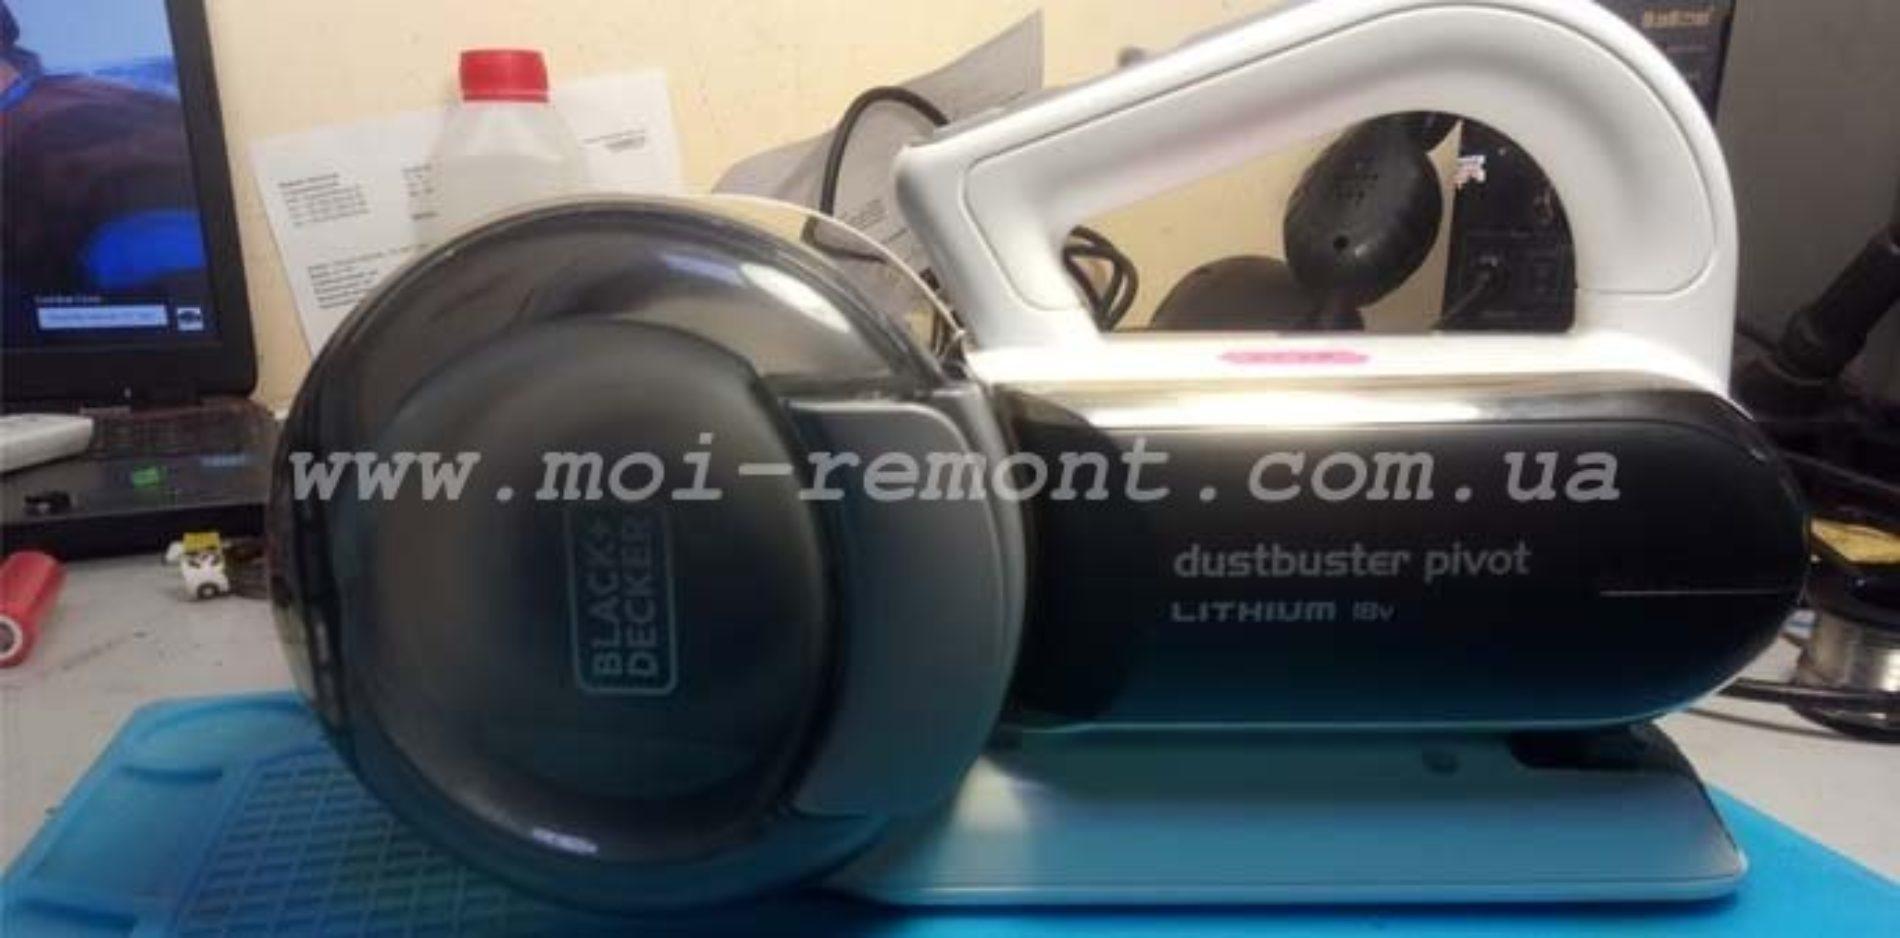 Ремонт пылесоса Black&Decker — замена аккумуляторов